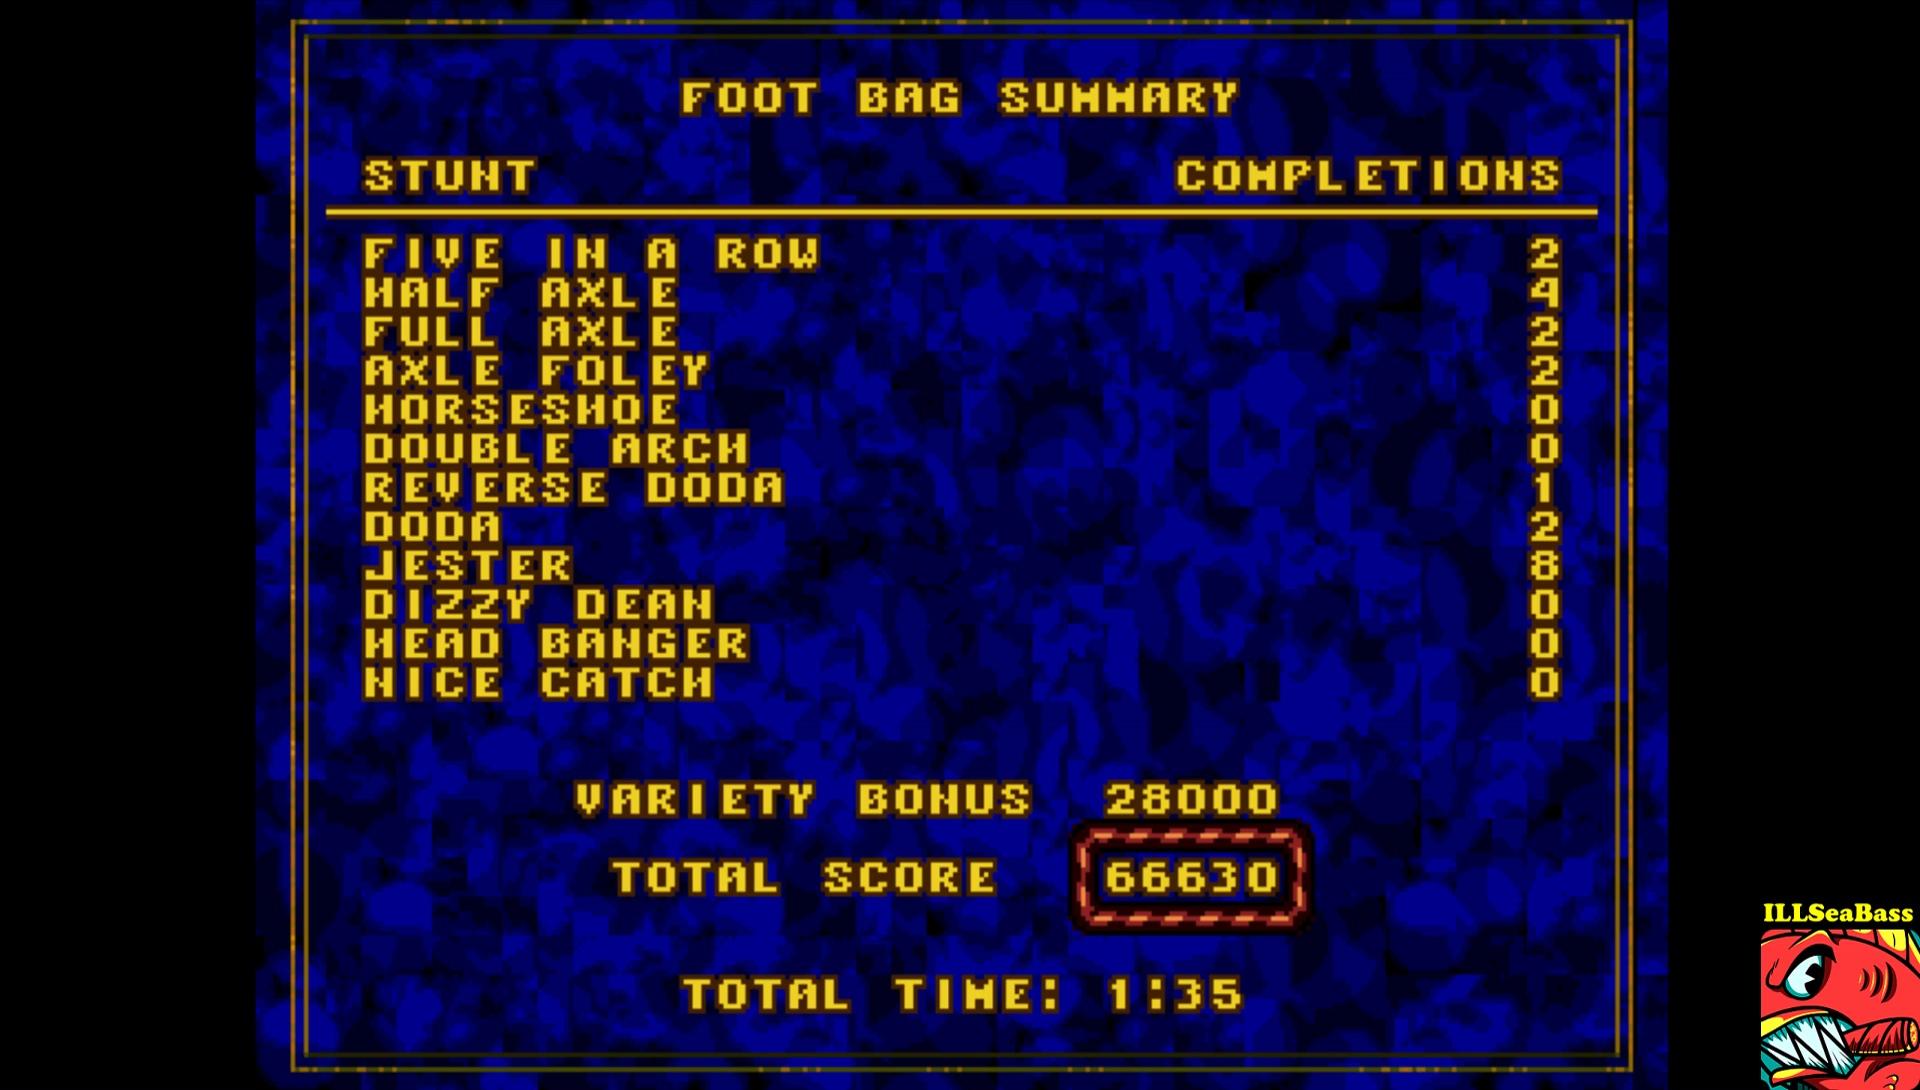 ILLSeaBass: California Games: Foot Bag (Sega Genesis / MegaDrive Emulated) 66,630 points on 2017-03-27 20:49:09